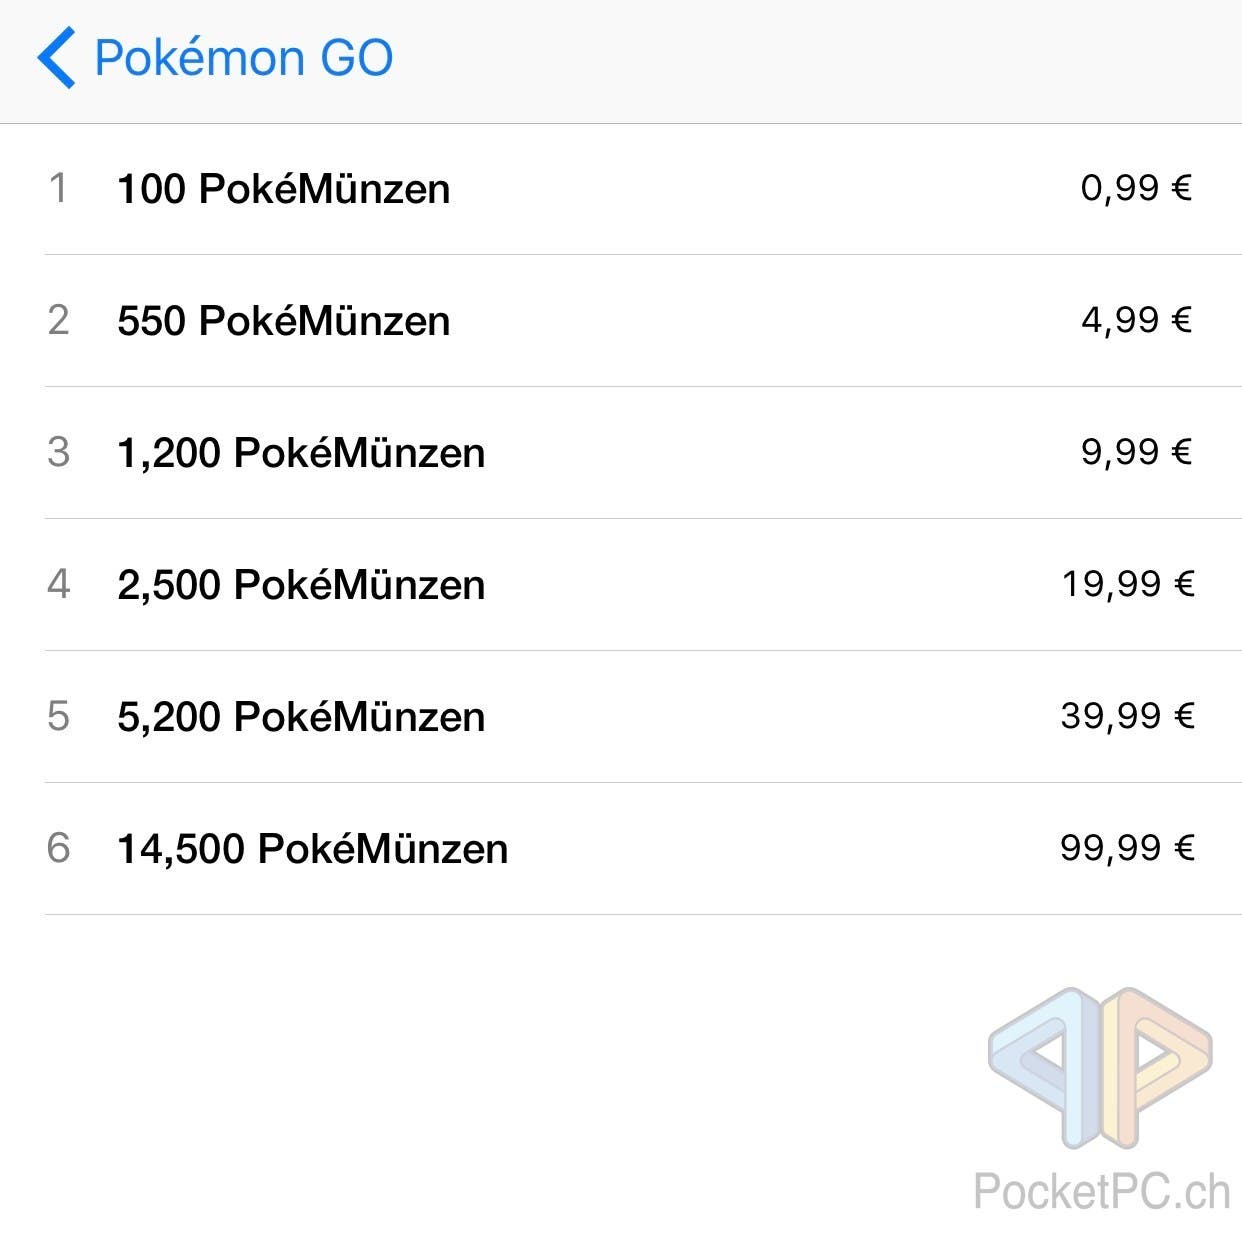 Pokémon GO inApp-Käufe